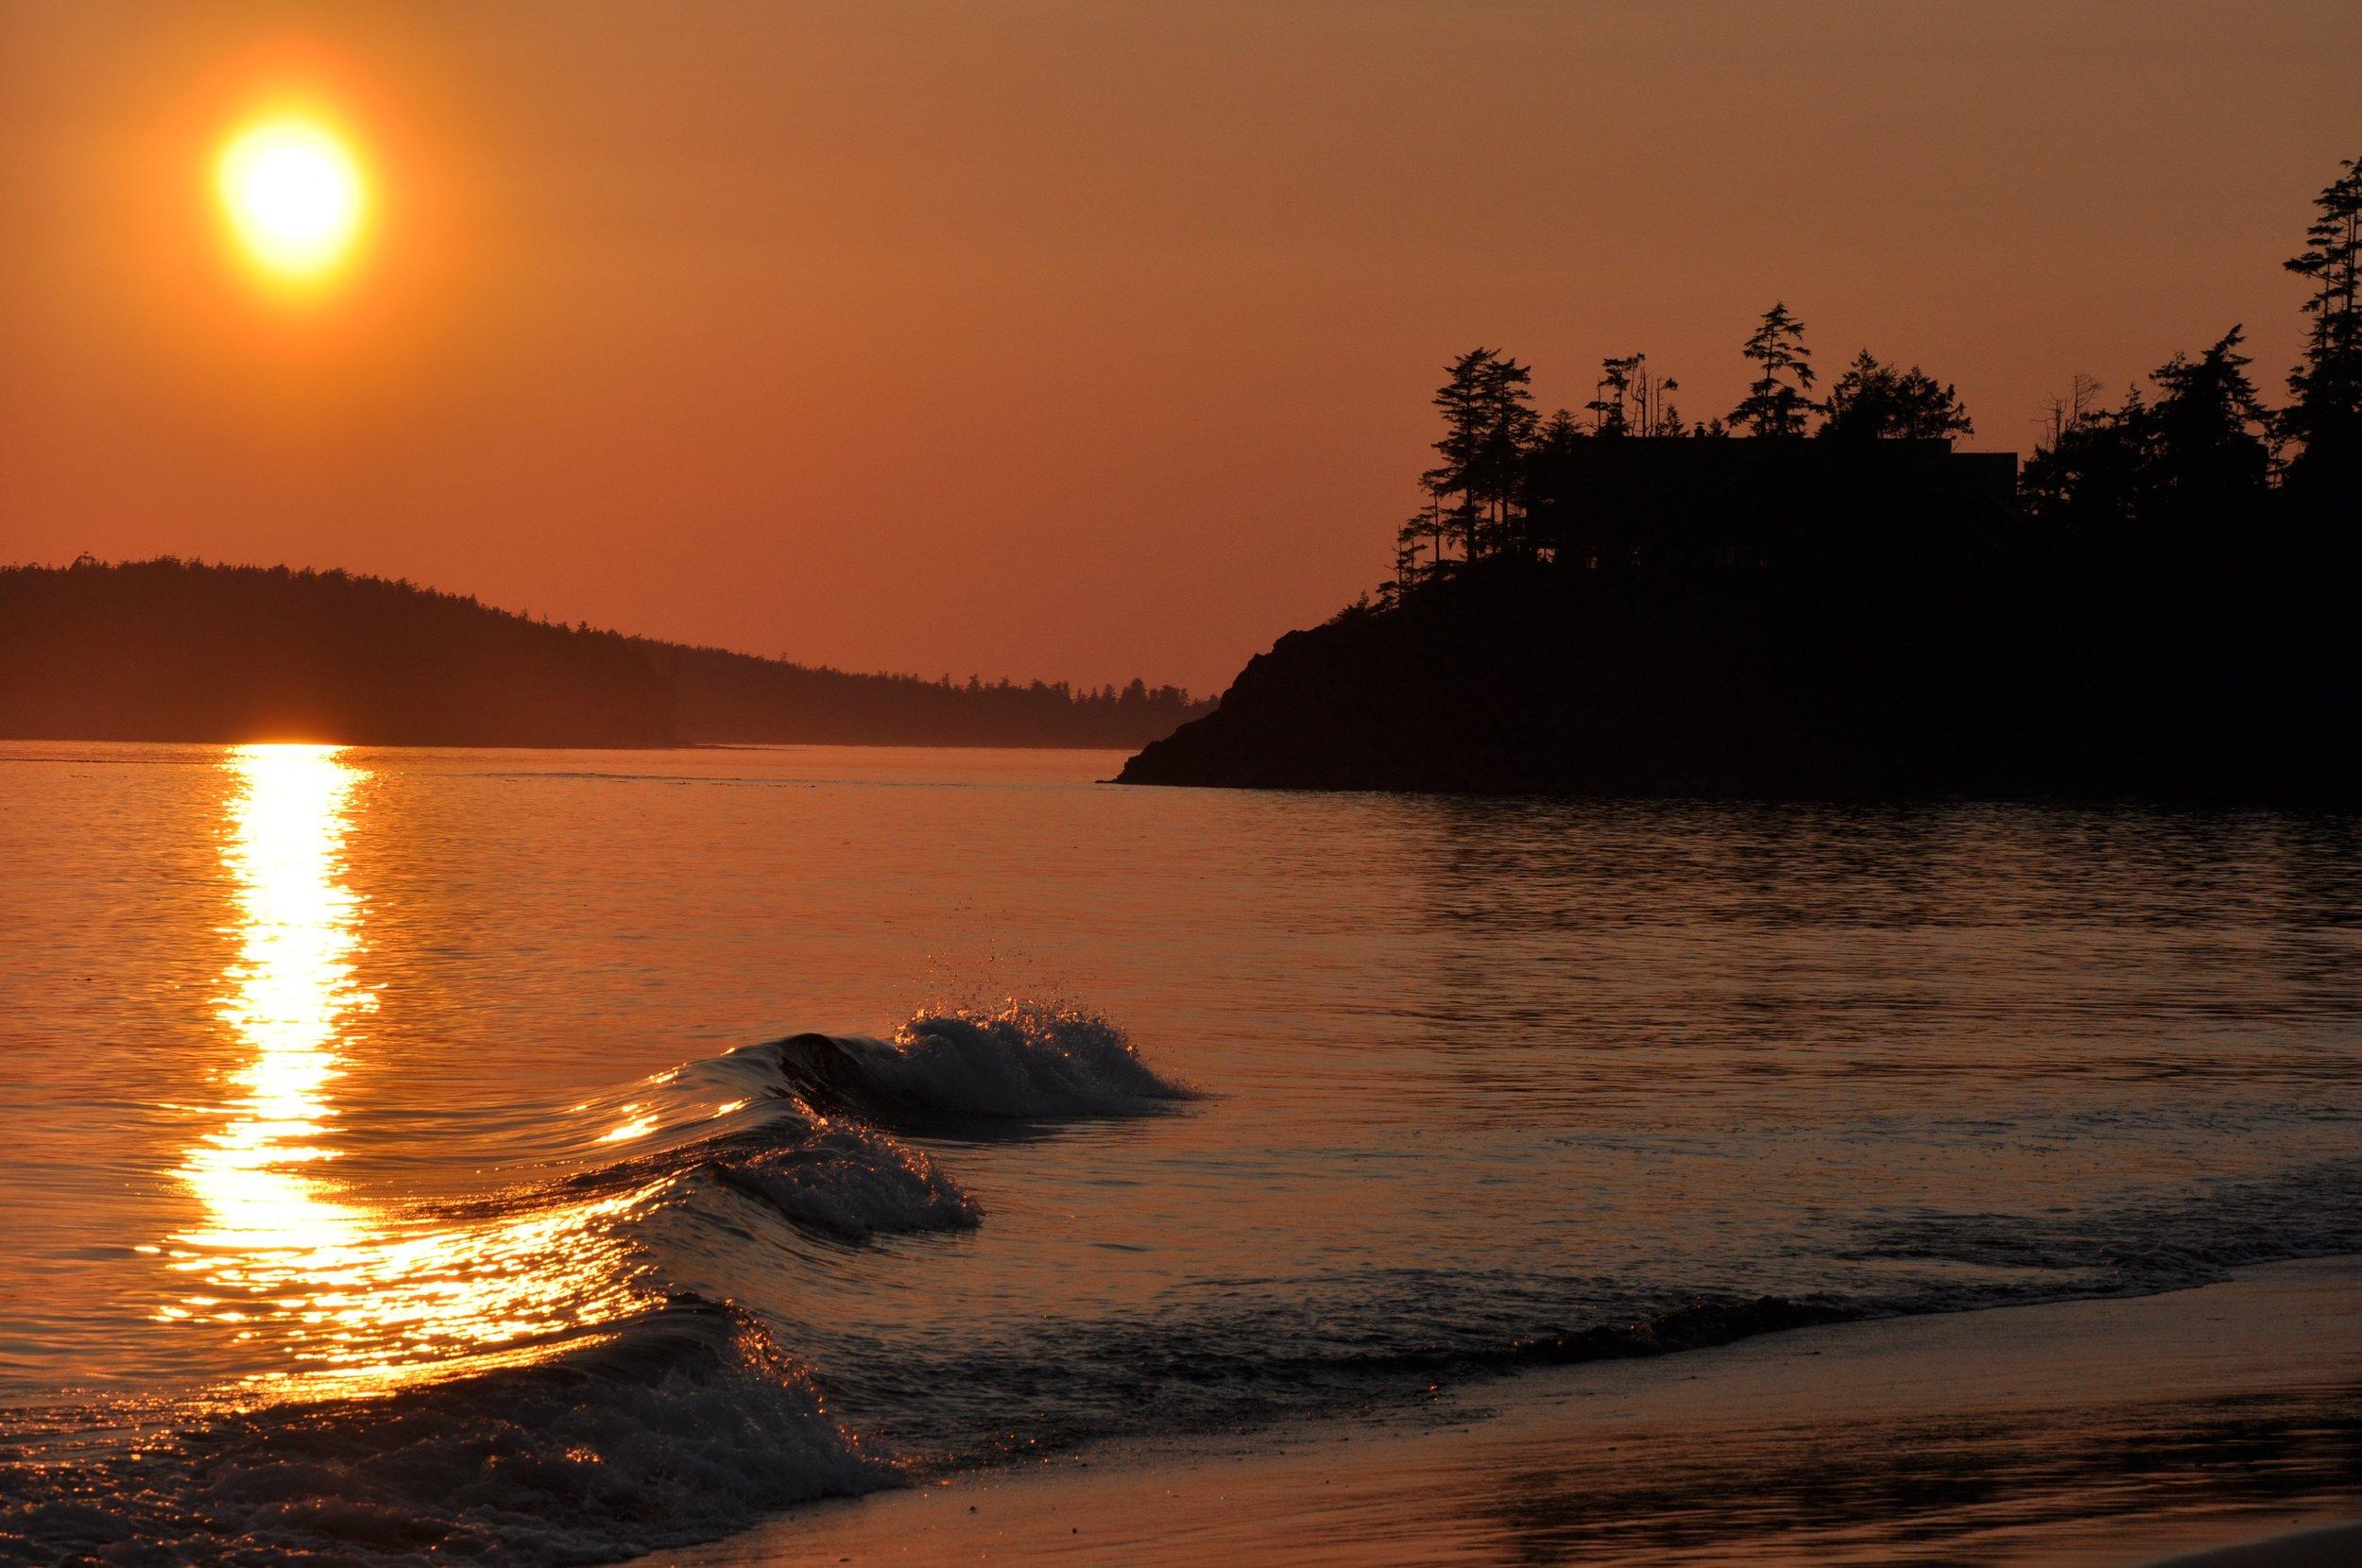 mackenzie-beach-1271367.jpg